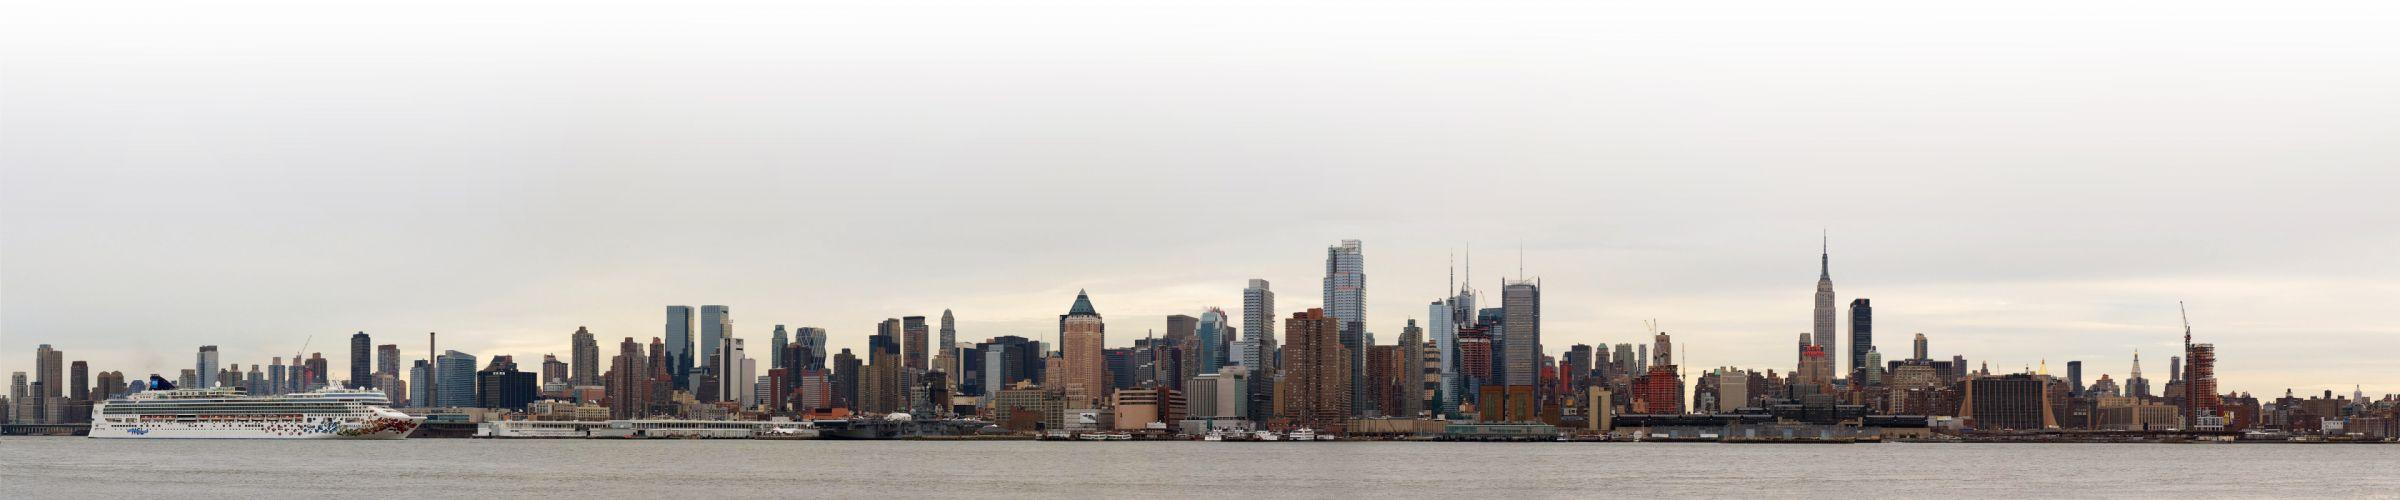 New York Cruise Ship Norwegian Gem boat f wallpaper